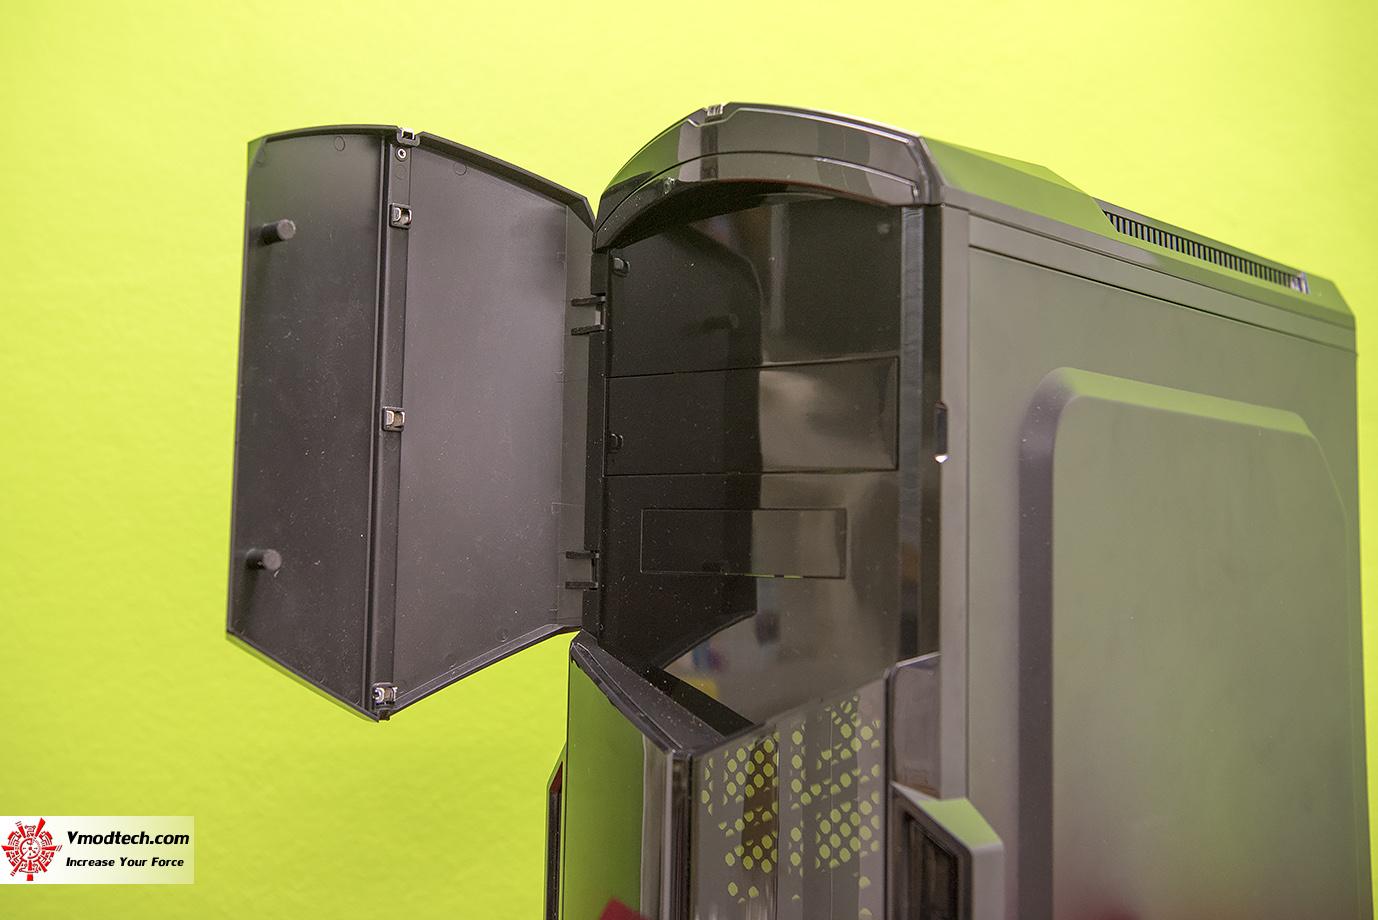 dsc 8181 Thermaltake Versa N21 Window Mid tower Chassis